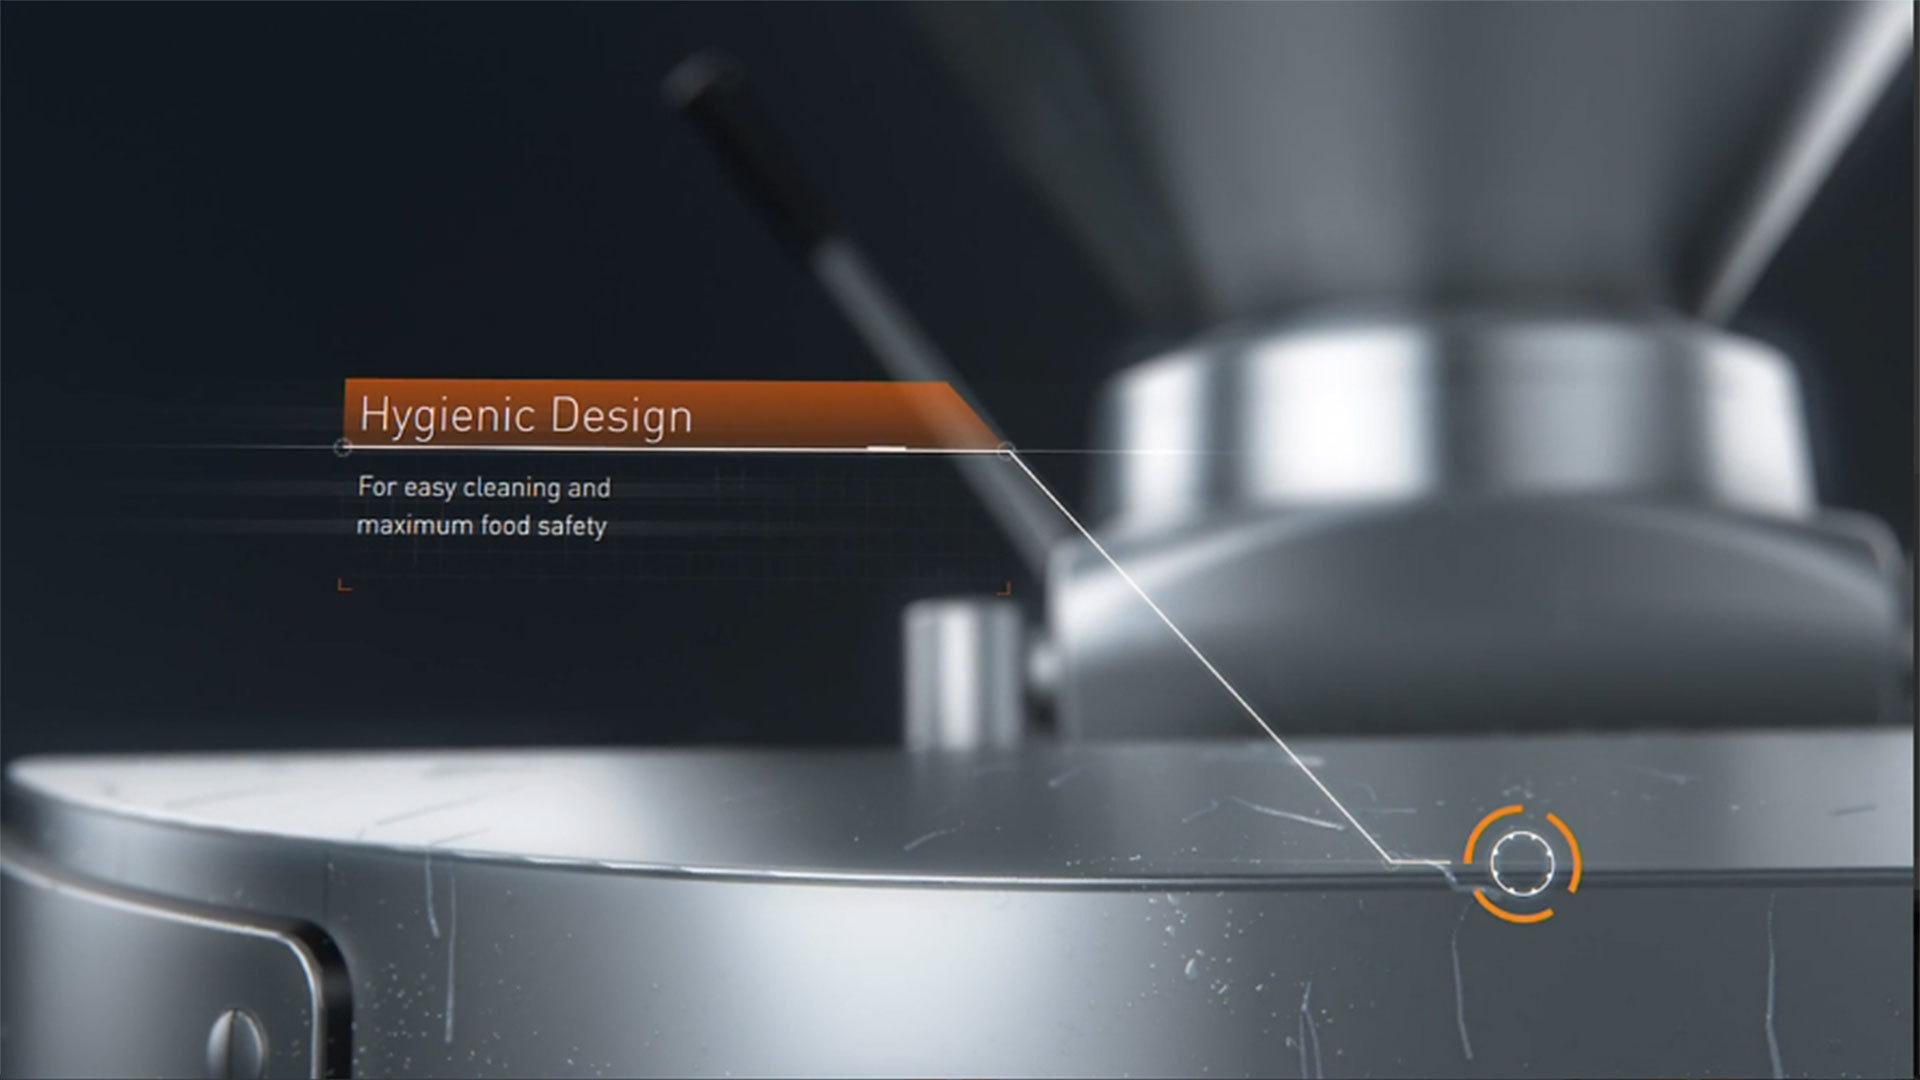 VF800 - Hygienic Design